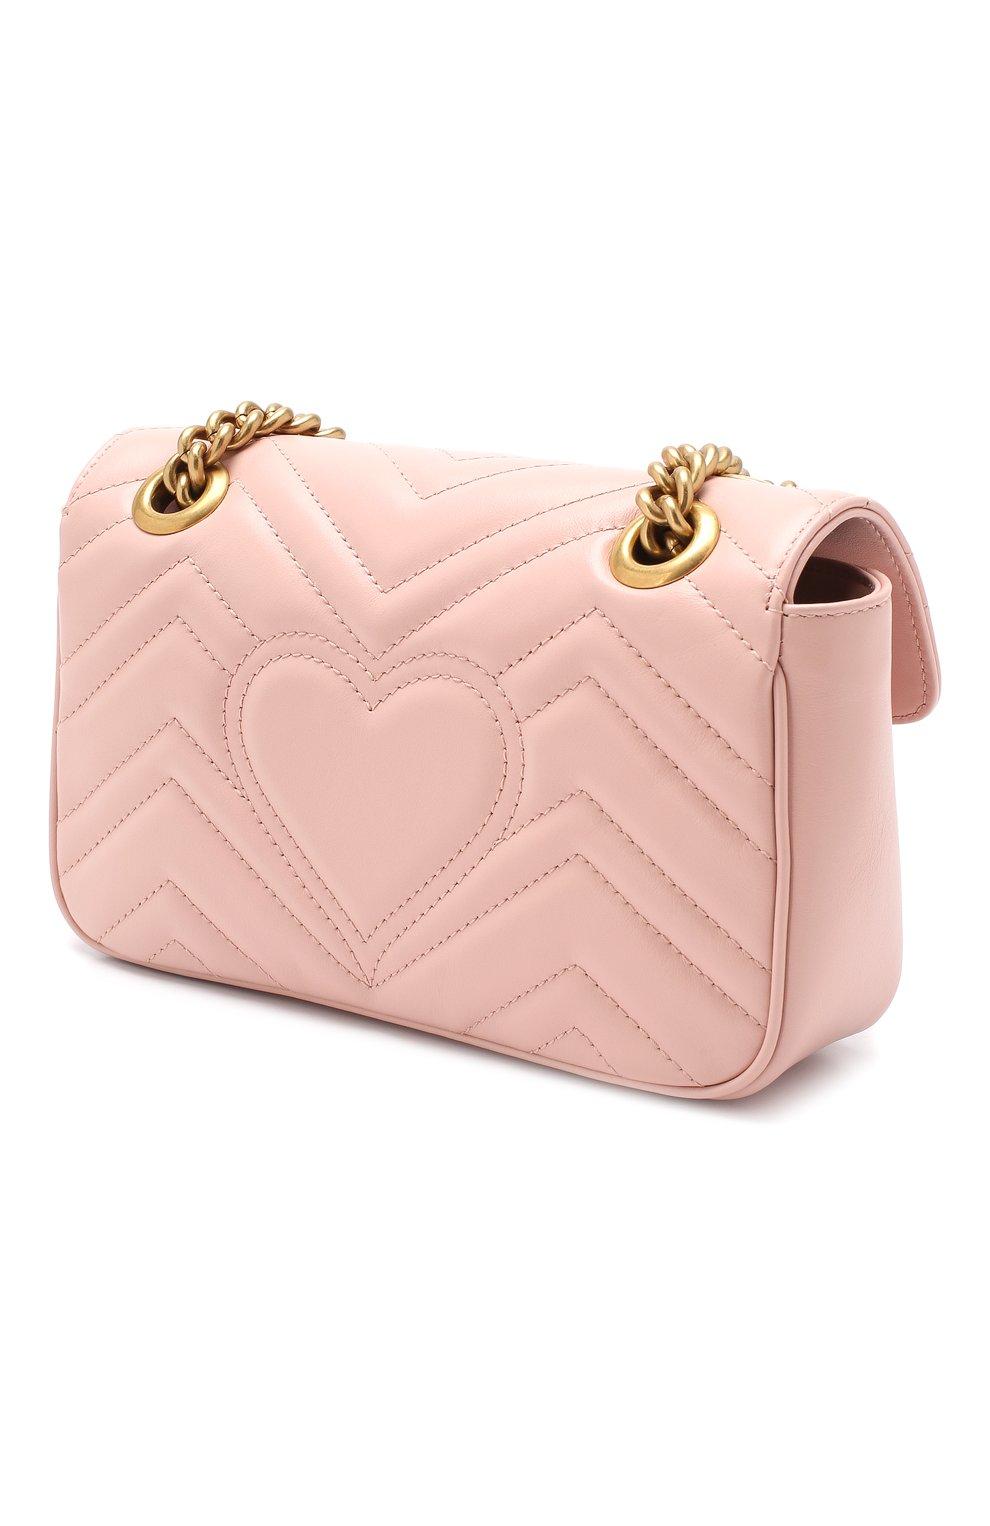 Сумка GG Marmont Gucci розовая цвета | Фото №3